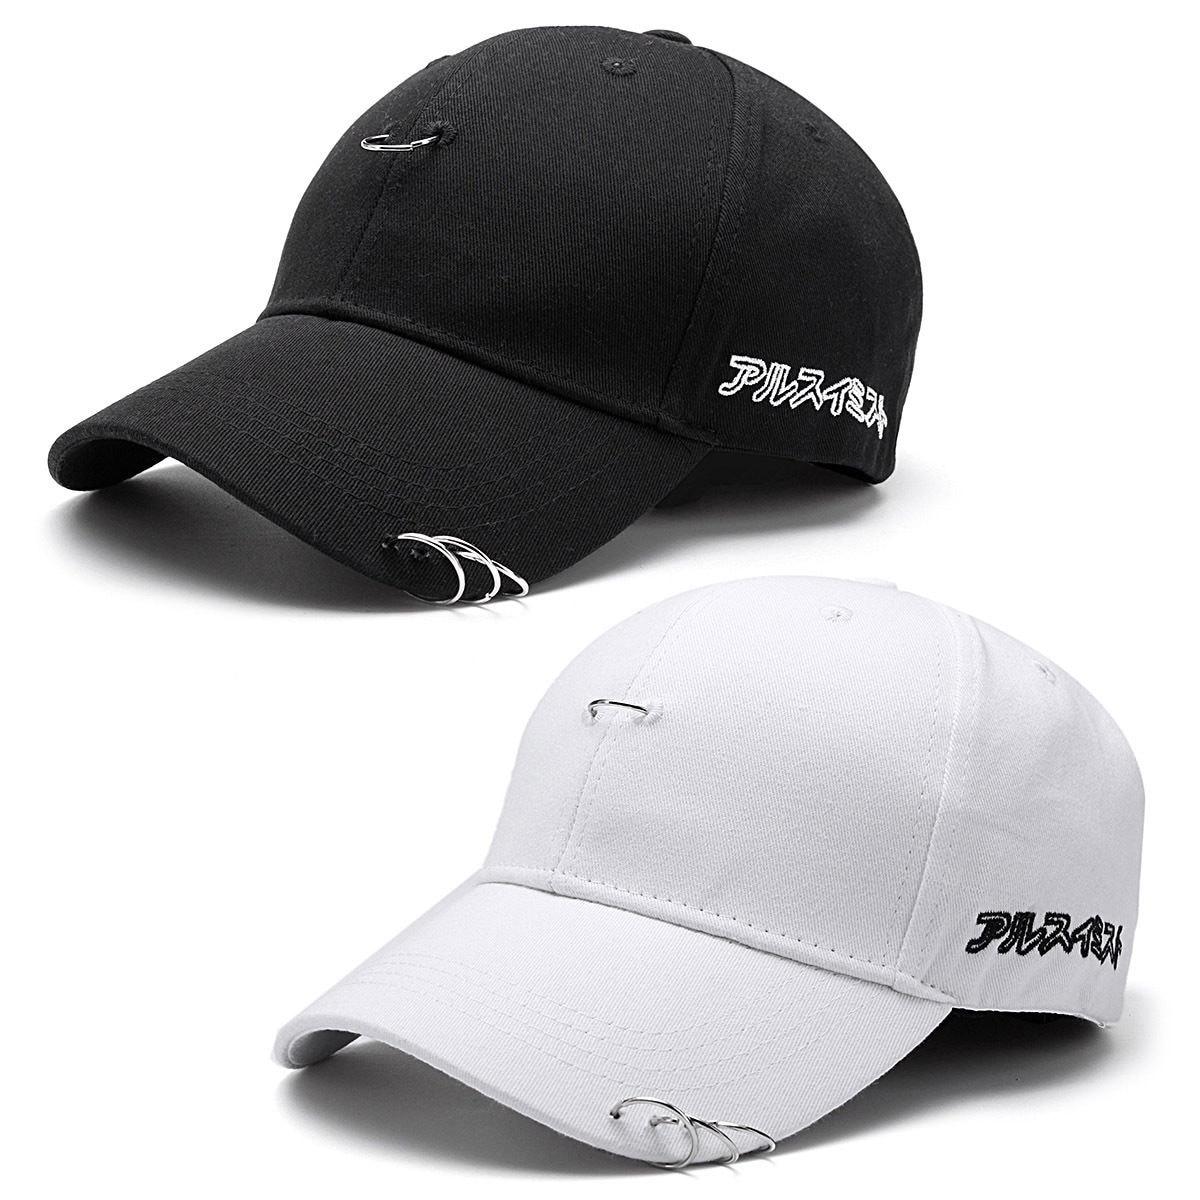 KPOP Hat  Piercing Ring Baseball Adjustable Cap Hip Hop Snapback Cap Fash LD